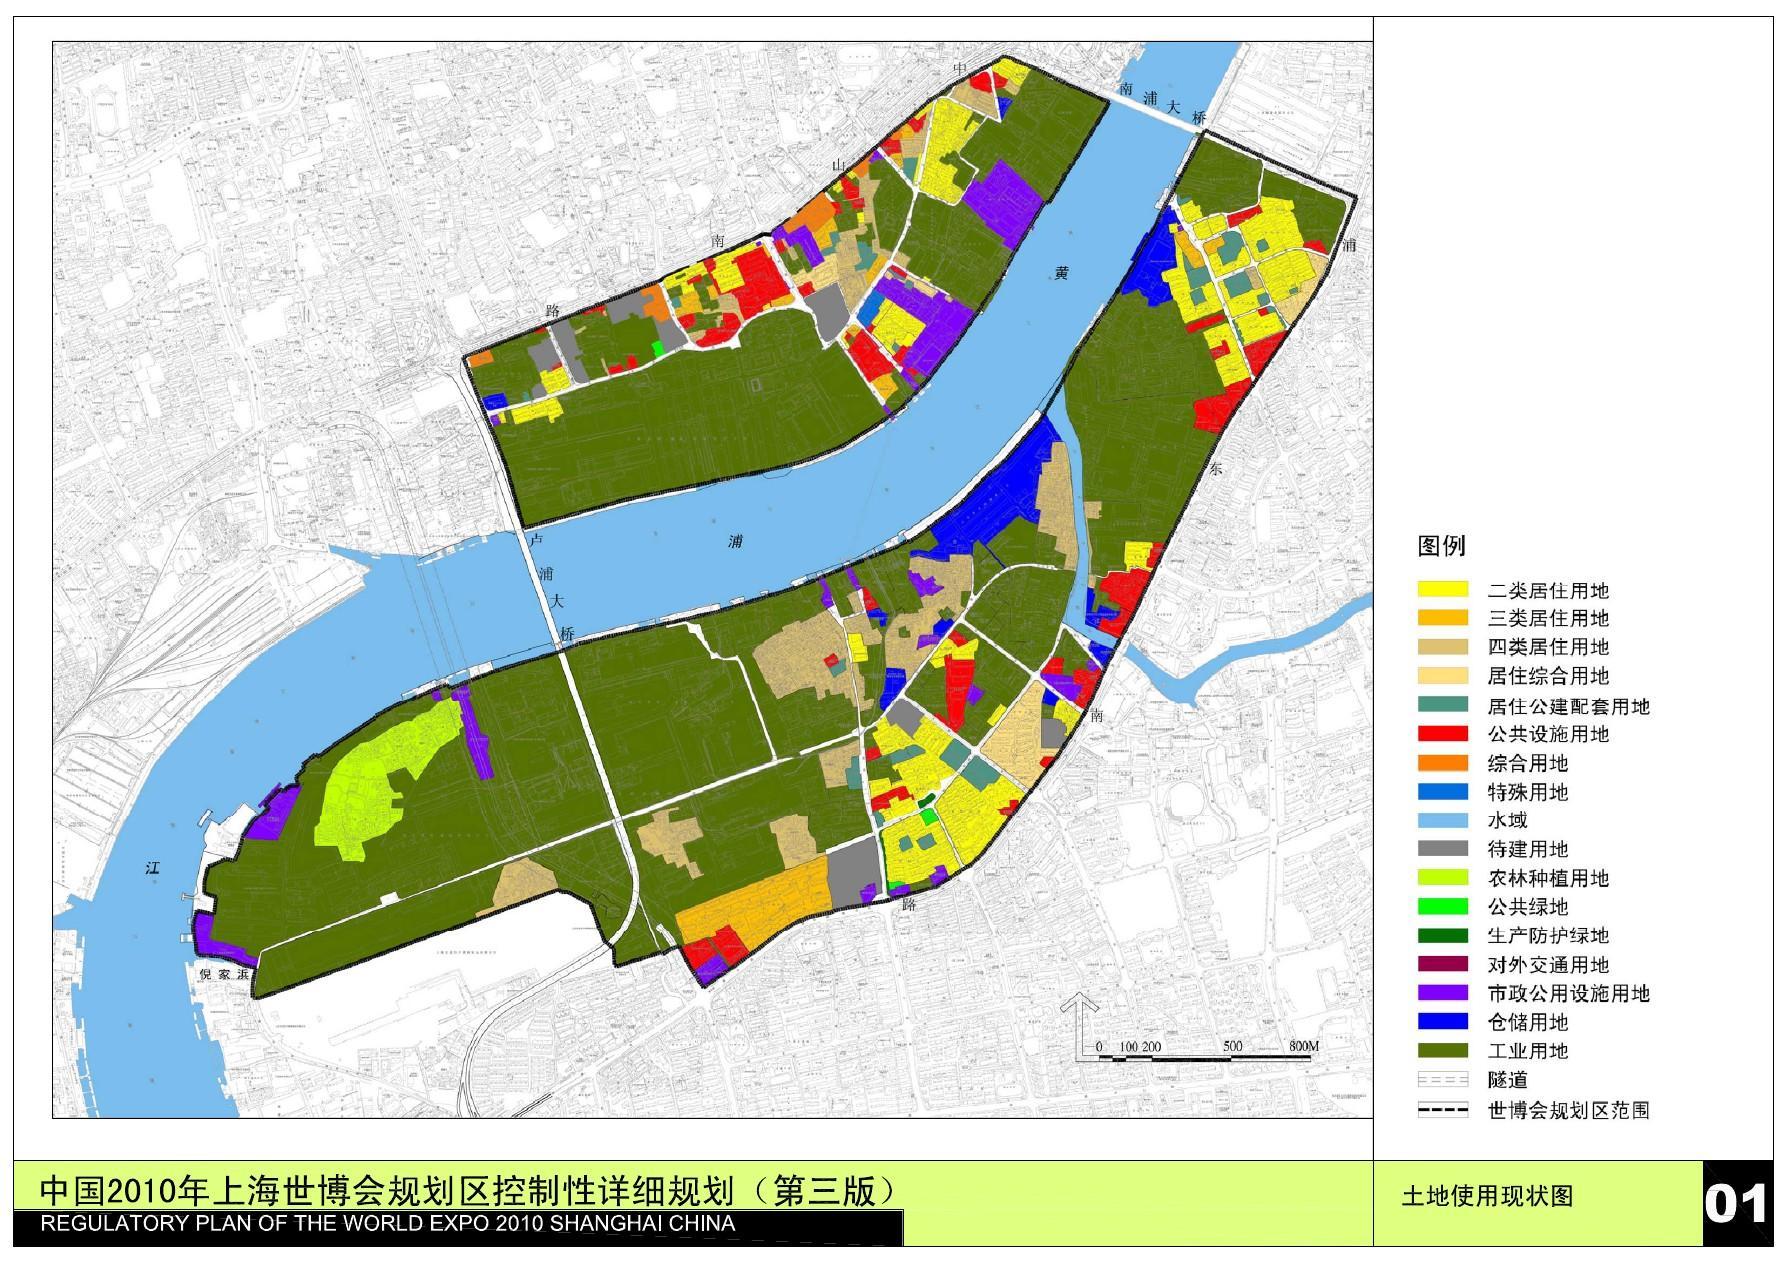 SHGEXPO-上海世博会控制区详细规划(第三版) - 01 土地使用现状图